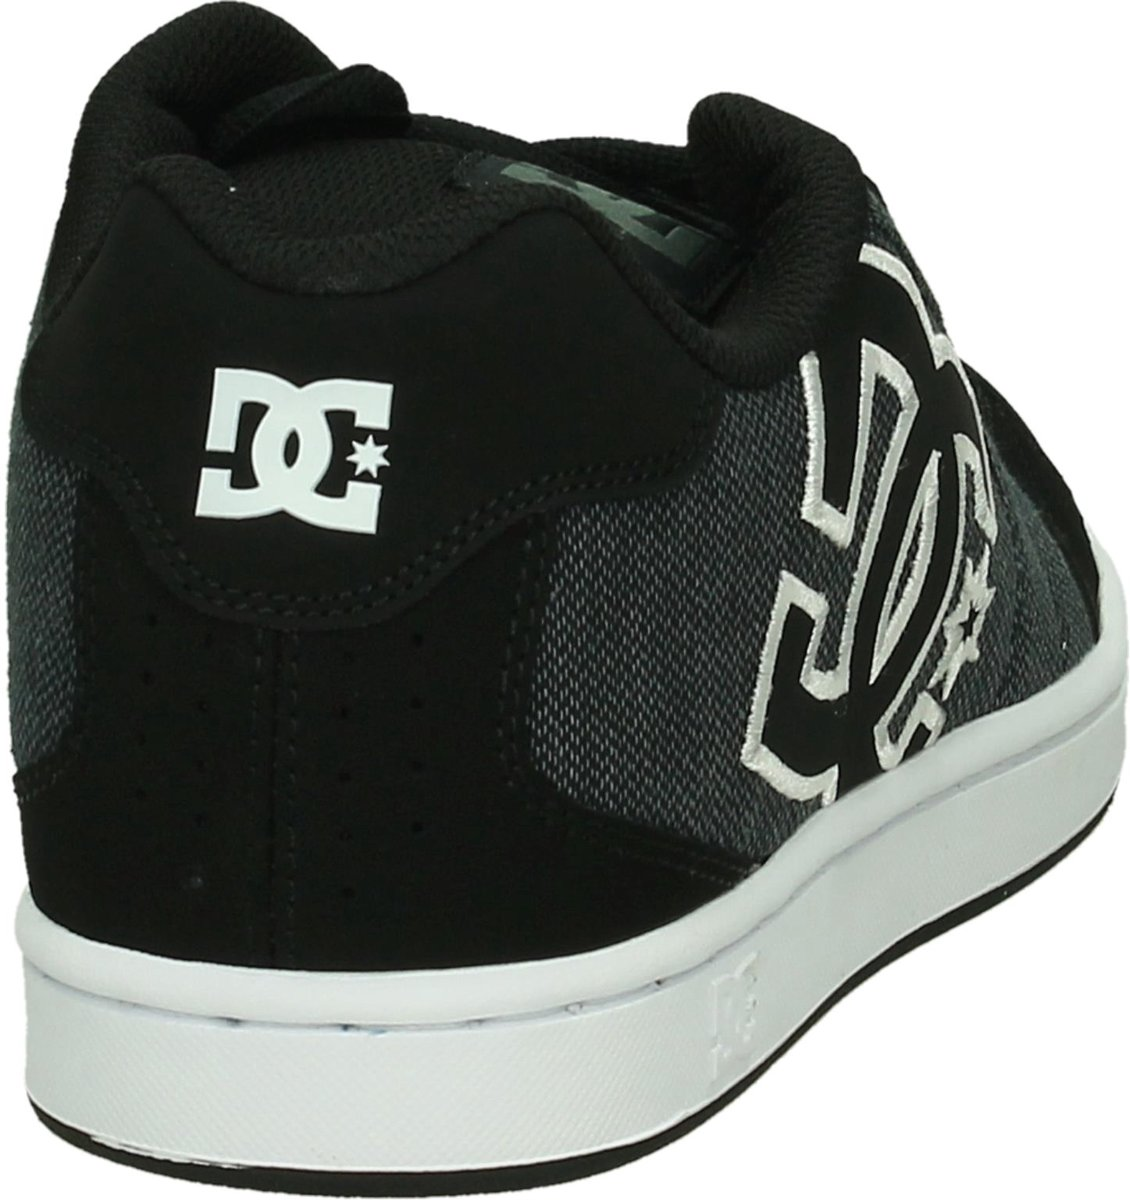 b2eb421942a bol.com   DC Shoes - Net Se - Skate laag - Heren - Maat 44,5 - Zwart - BKZ  -Black Dark Used